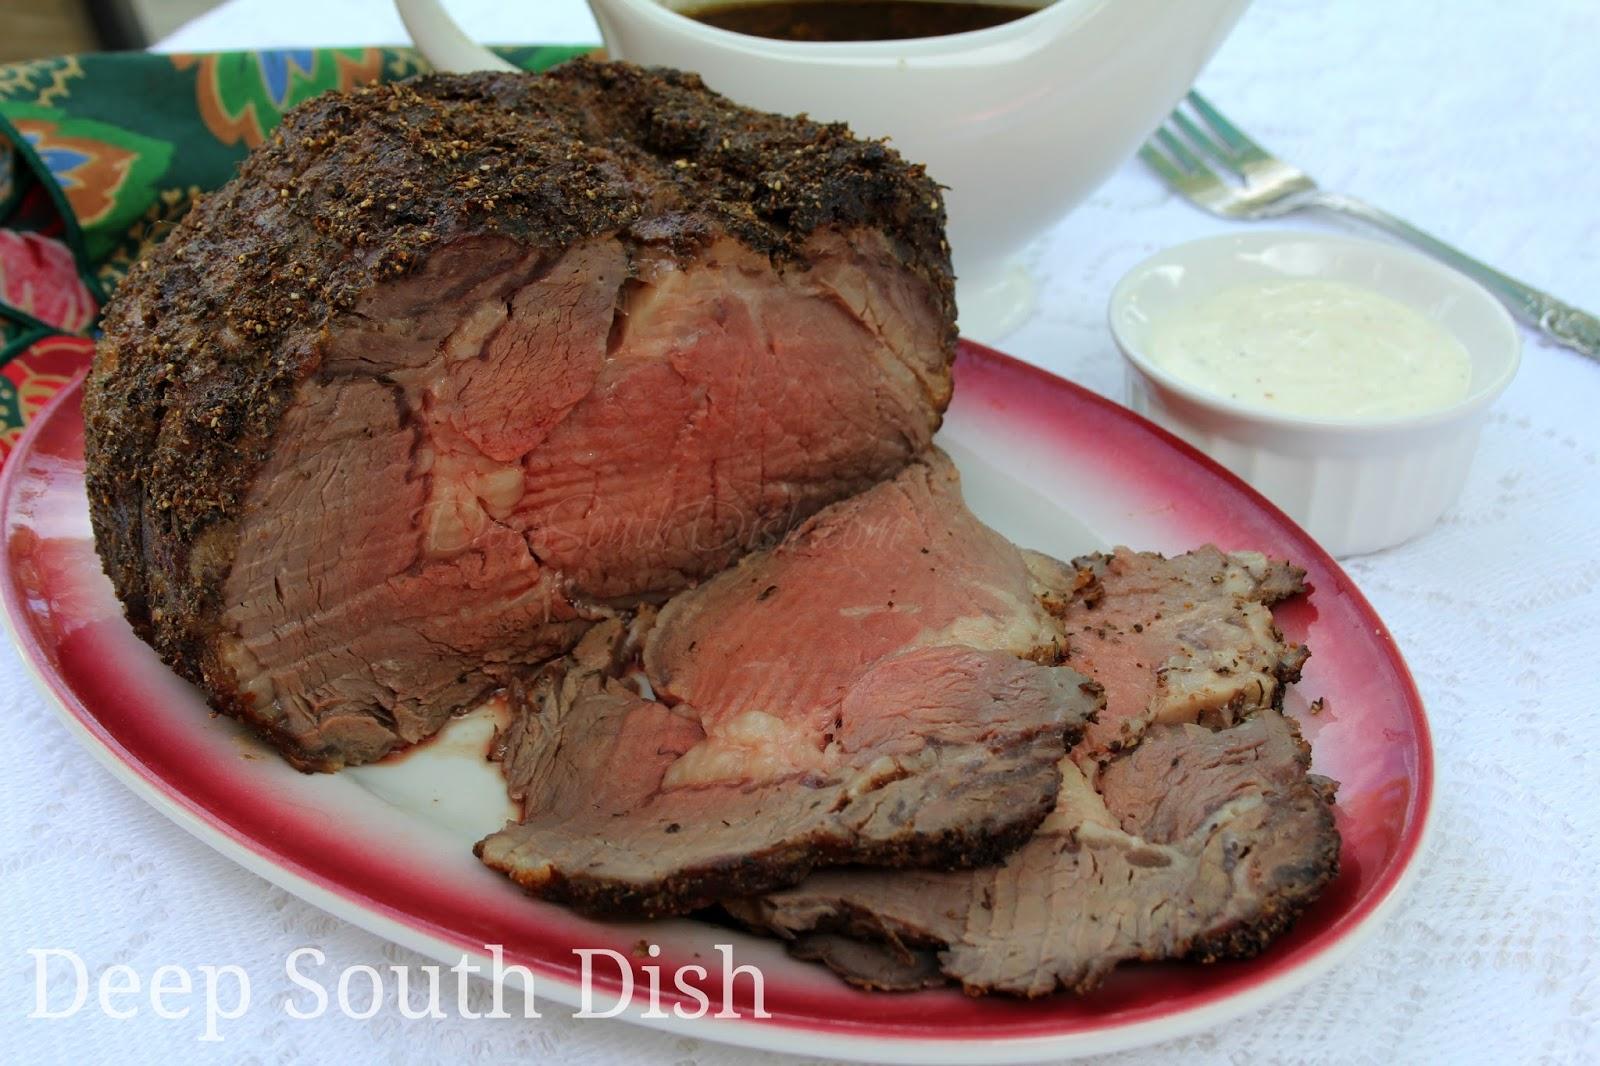 Boneless Prime Rib Beef Roast With Au Jus